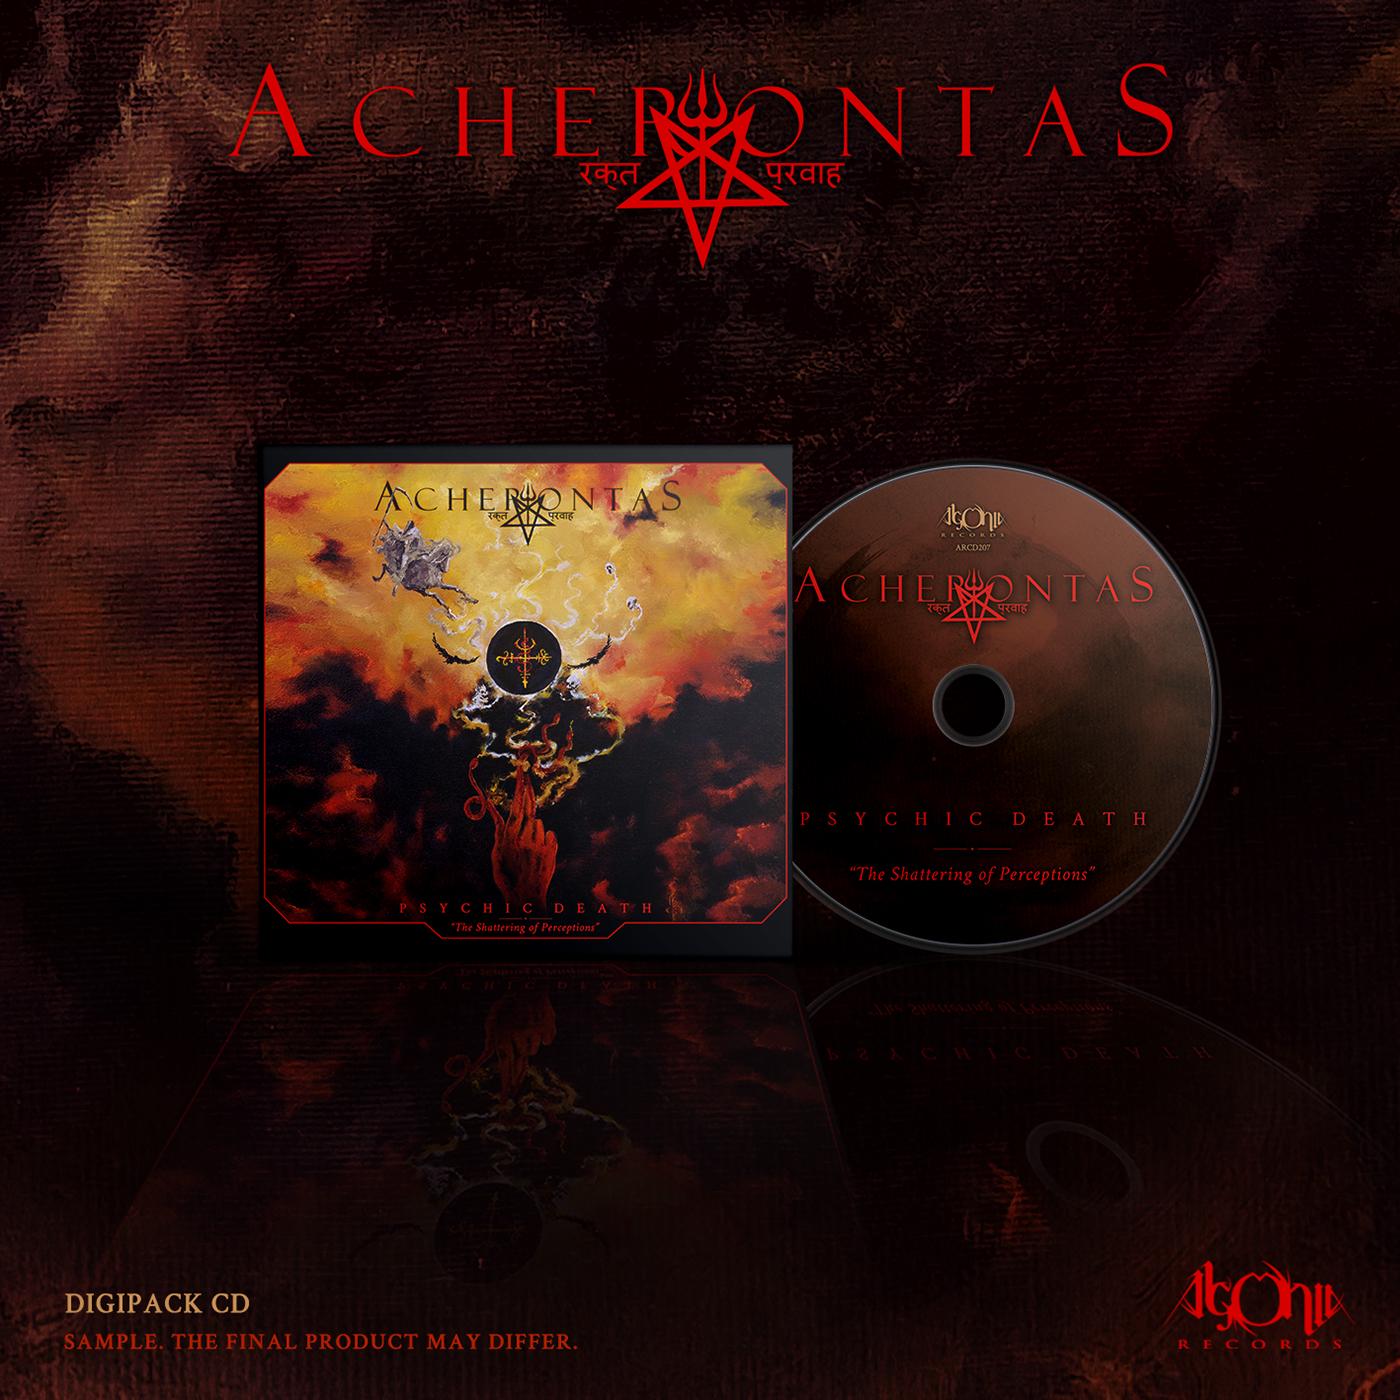 Psychicdeath Digipak CD Bundle